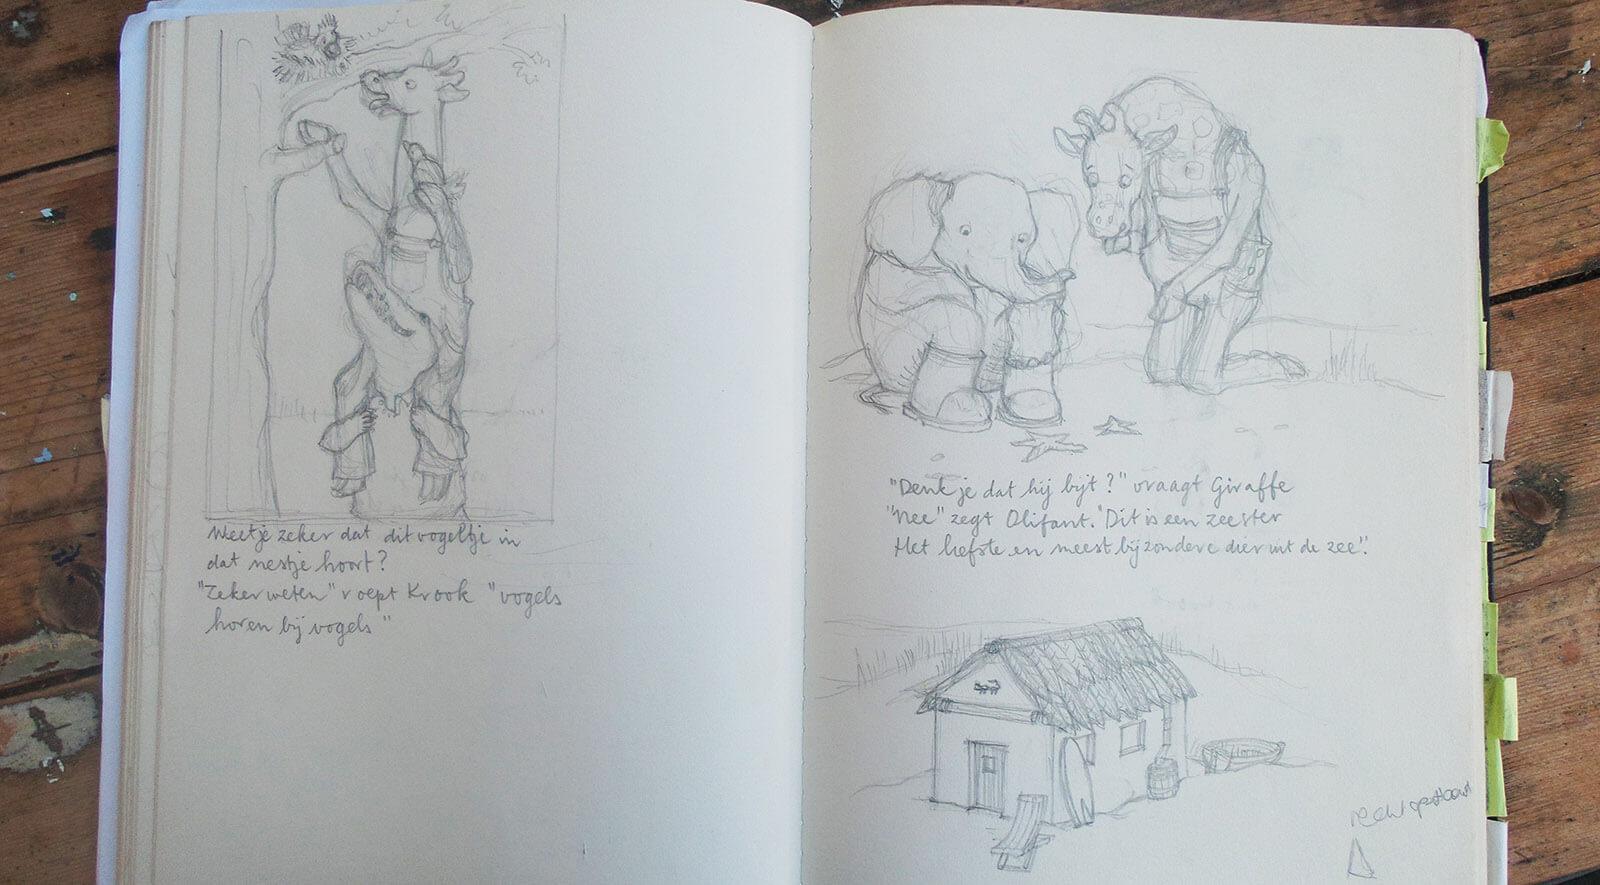 schetsboek-giraf-2.jpg